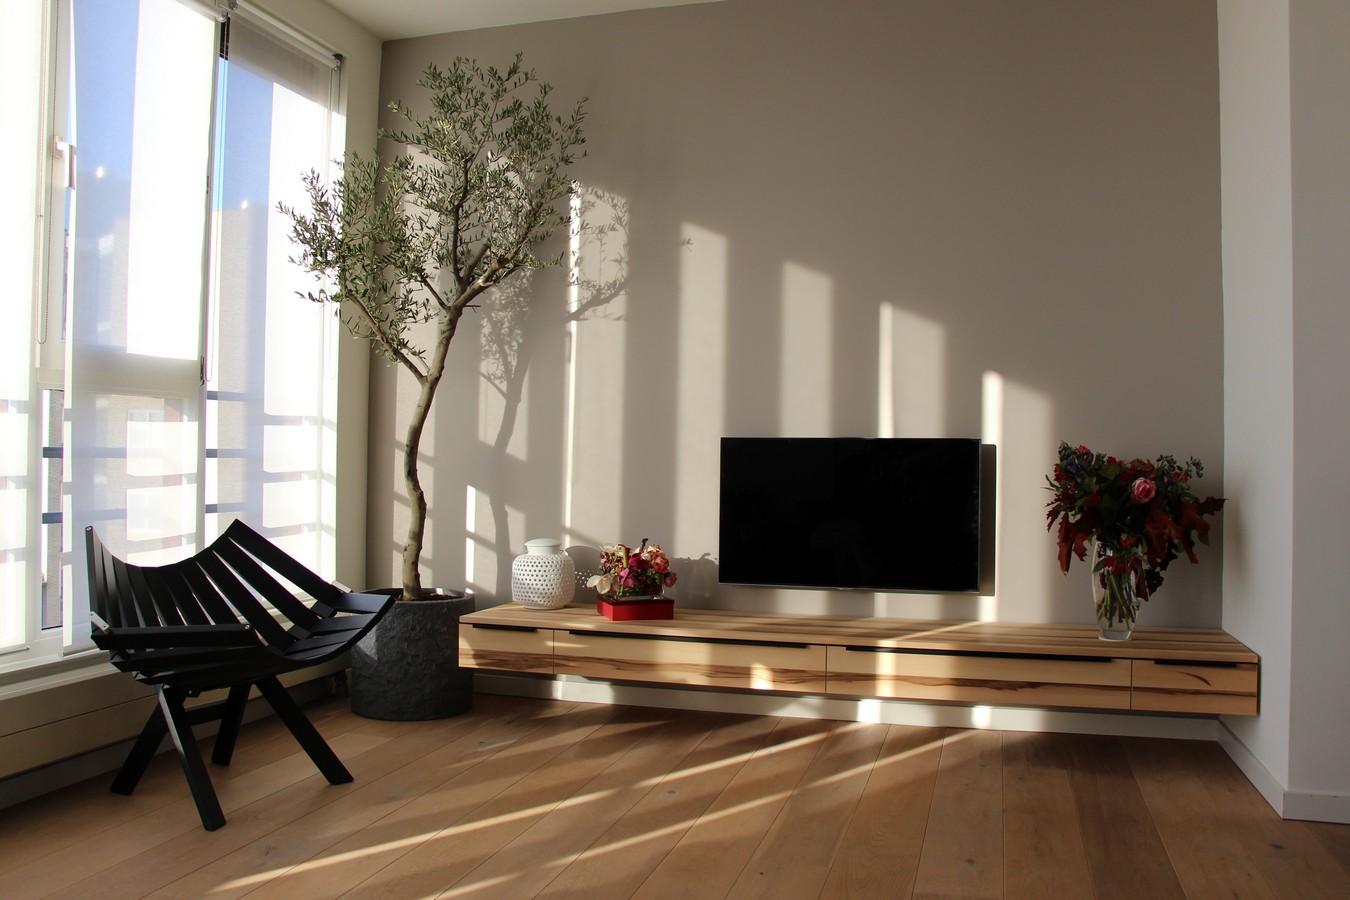 Tv meubels bijzetmeubelen weba meubelen